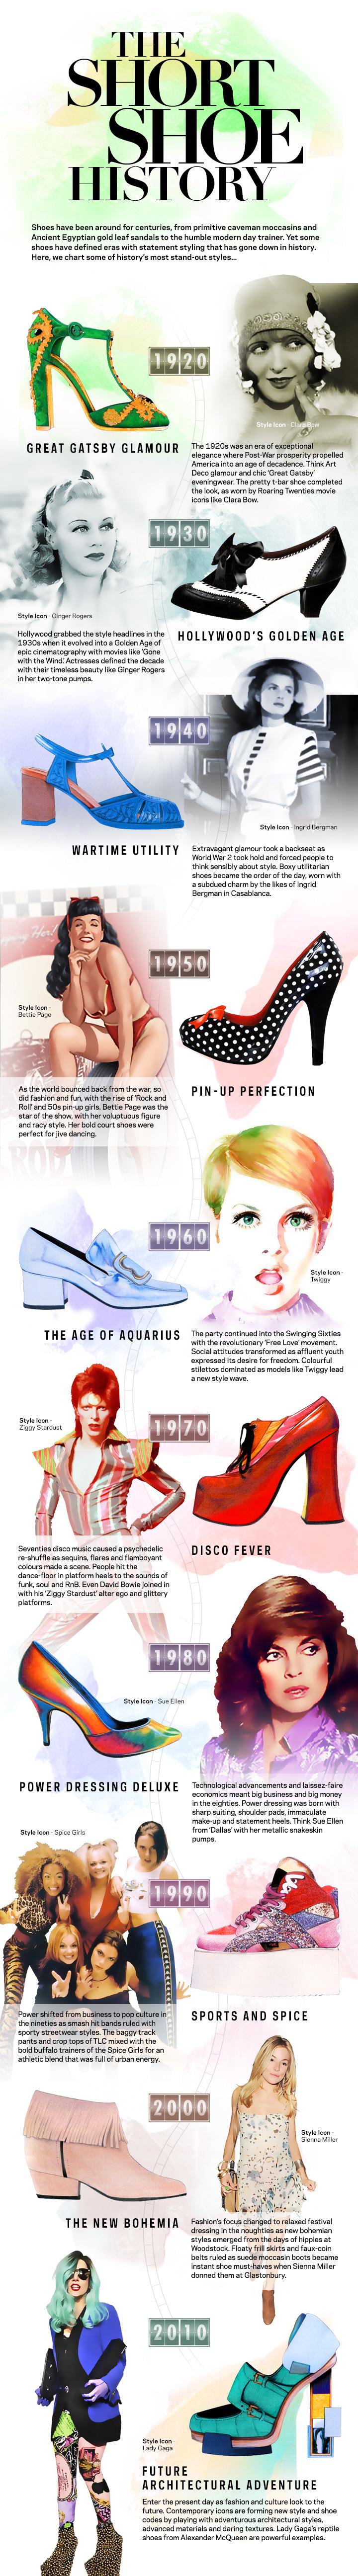 Short Shoe History Graphic